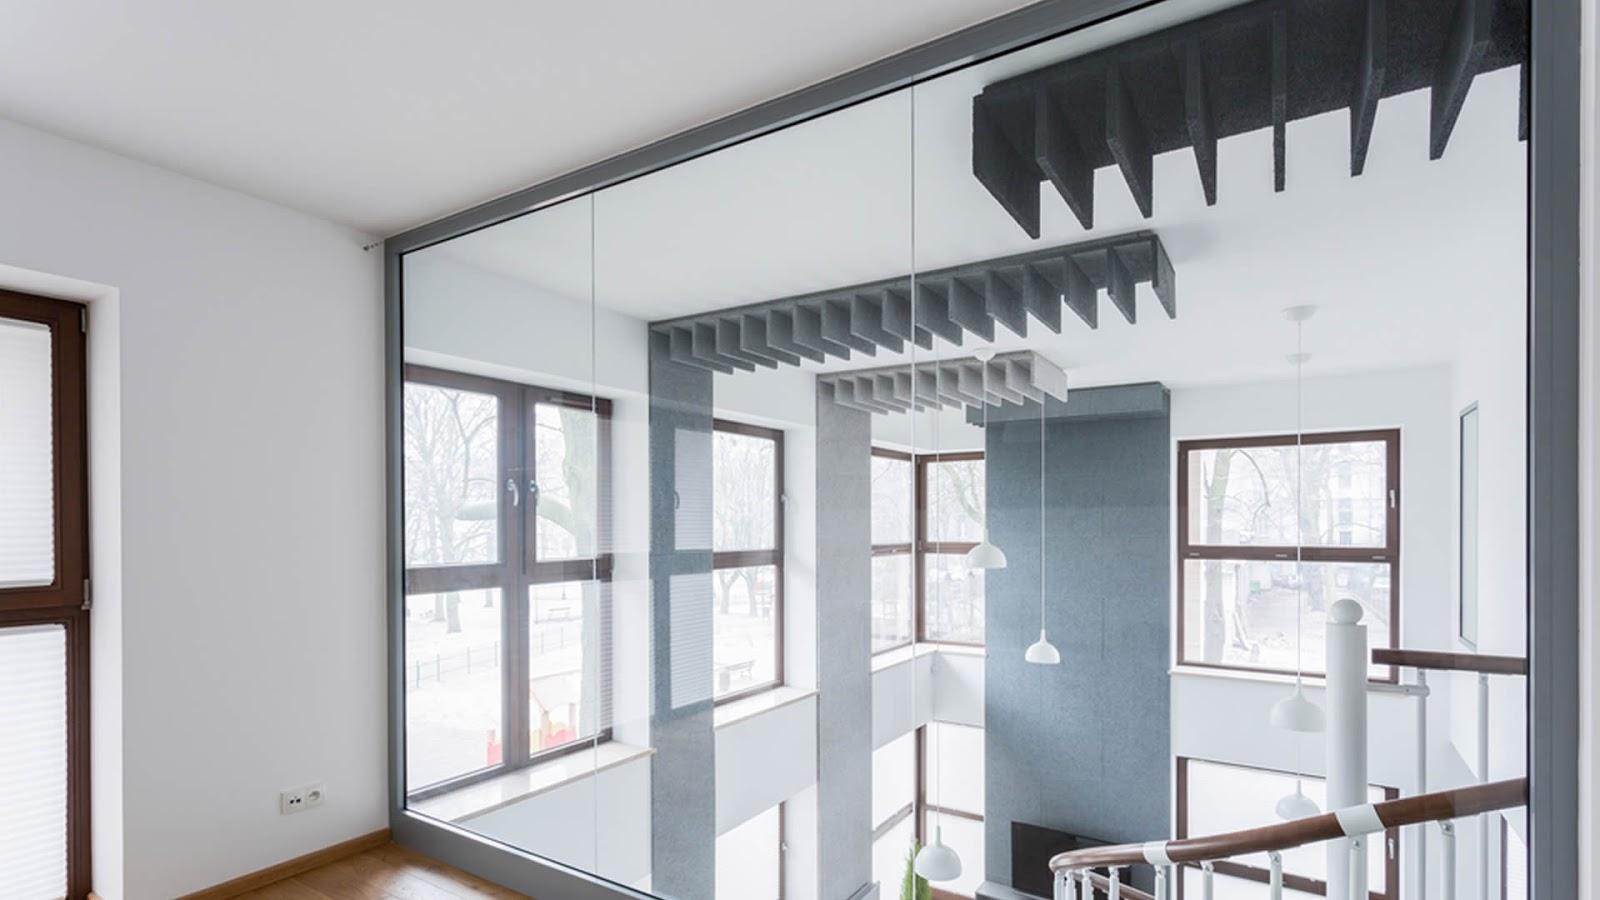 Afmeting Badkamer Spiegel : Spiegels in alle gewenste afmetingen vigoureux glaswerken wijnegem